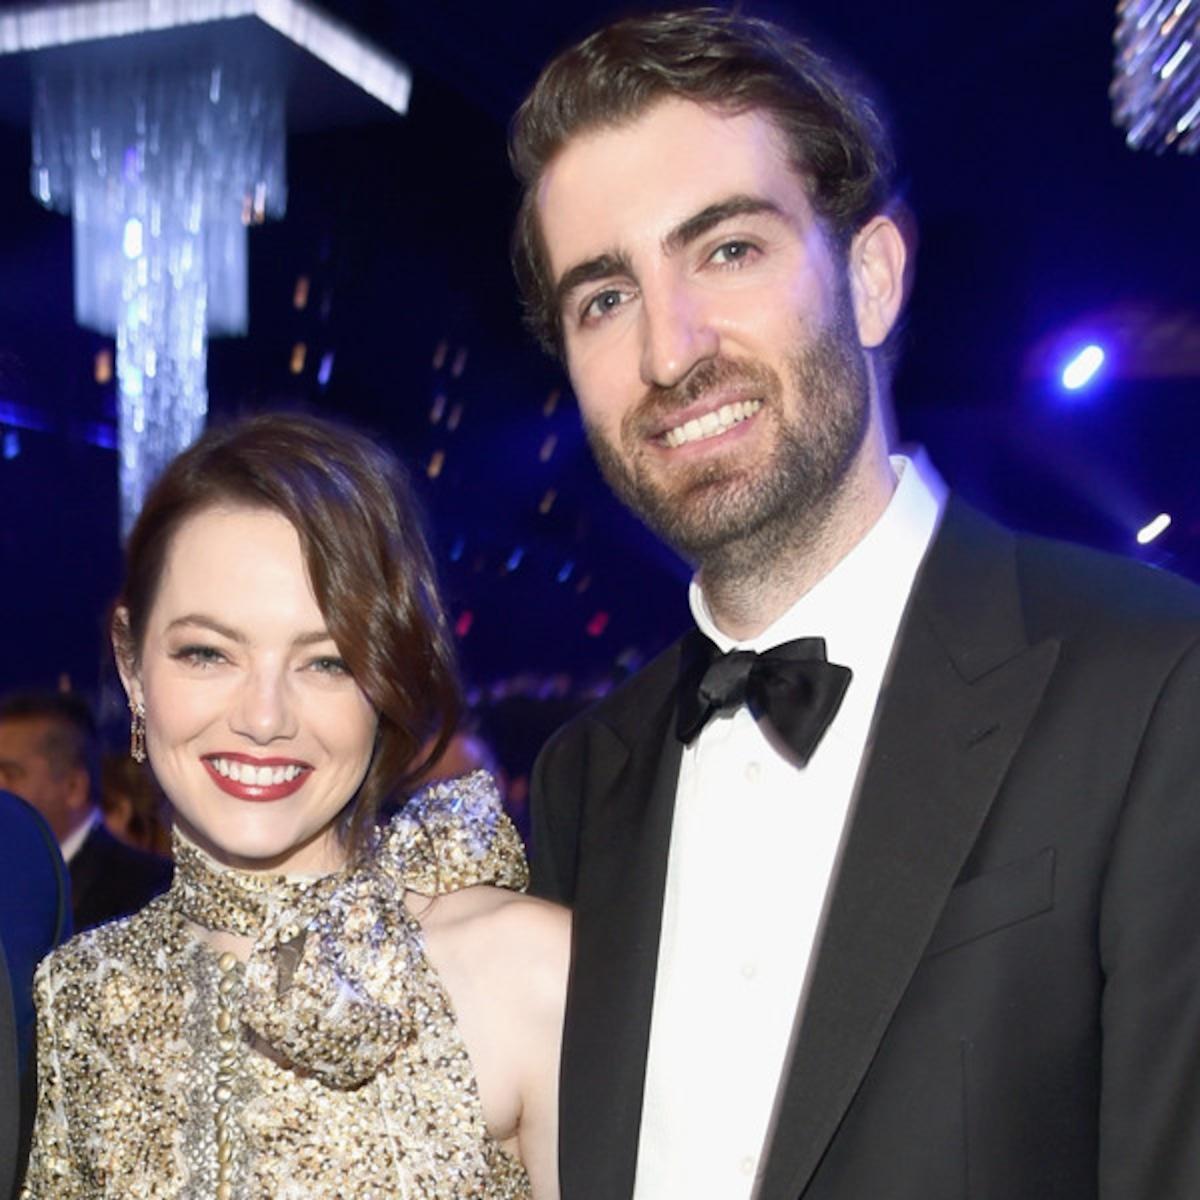 snl stars dating dating online în kwazulu natal